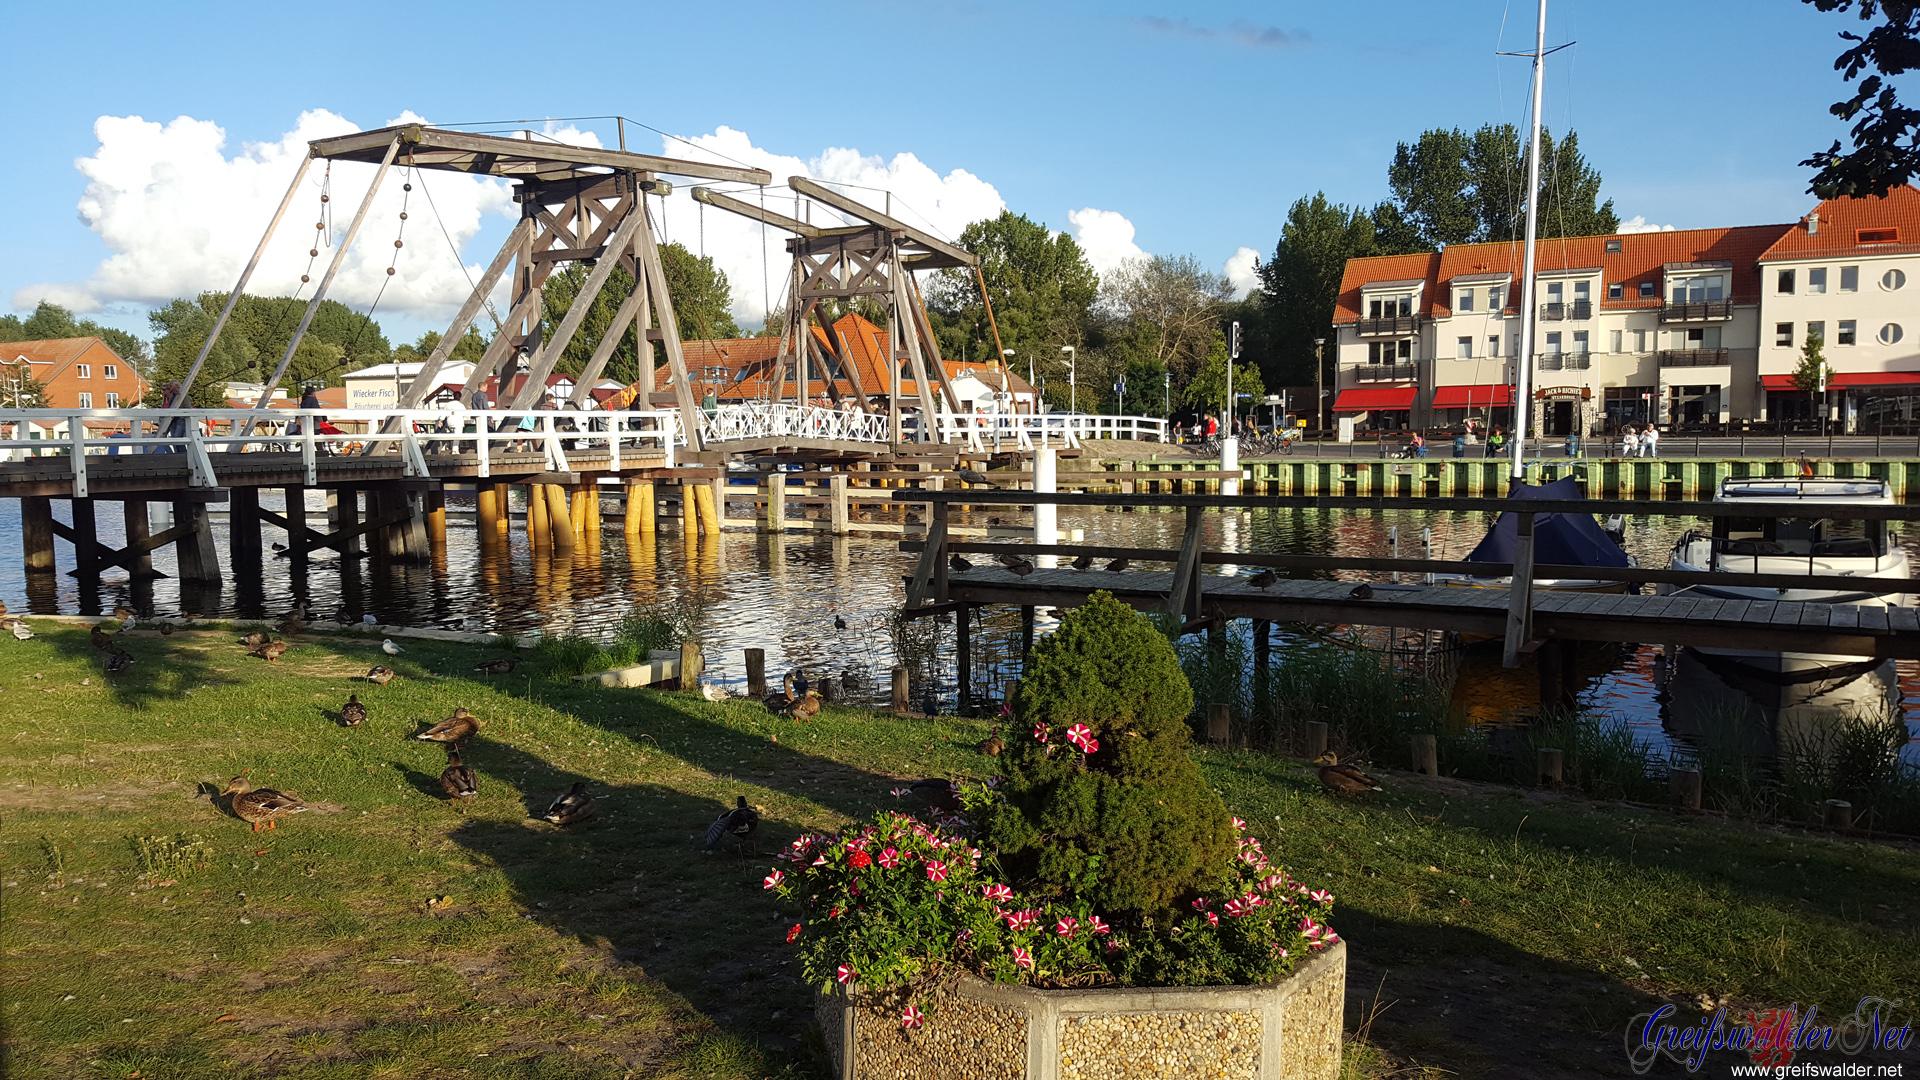 Septemberabend in Greifswald-Wieck